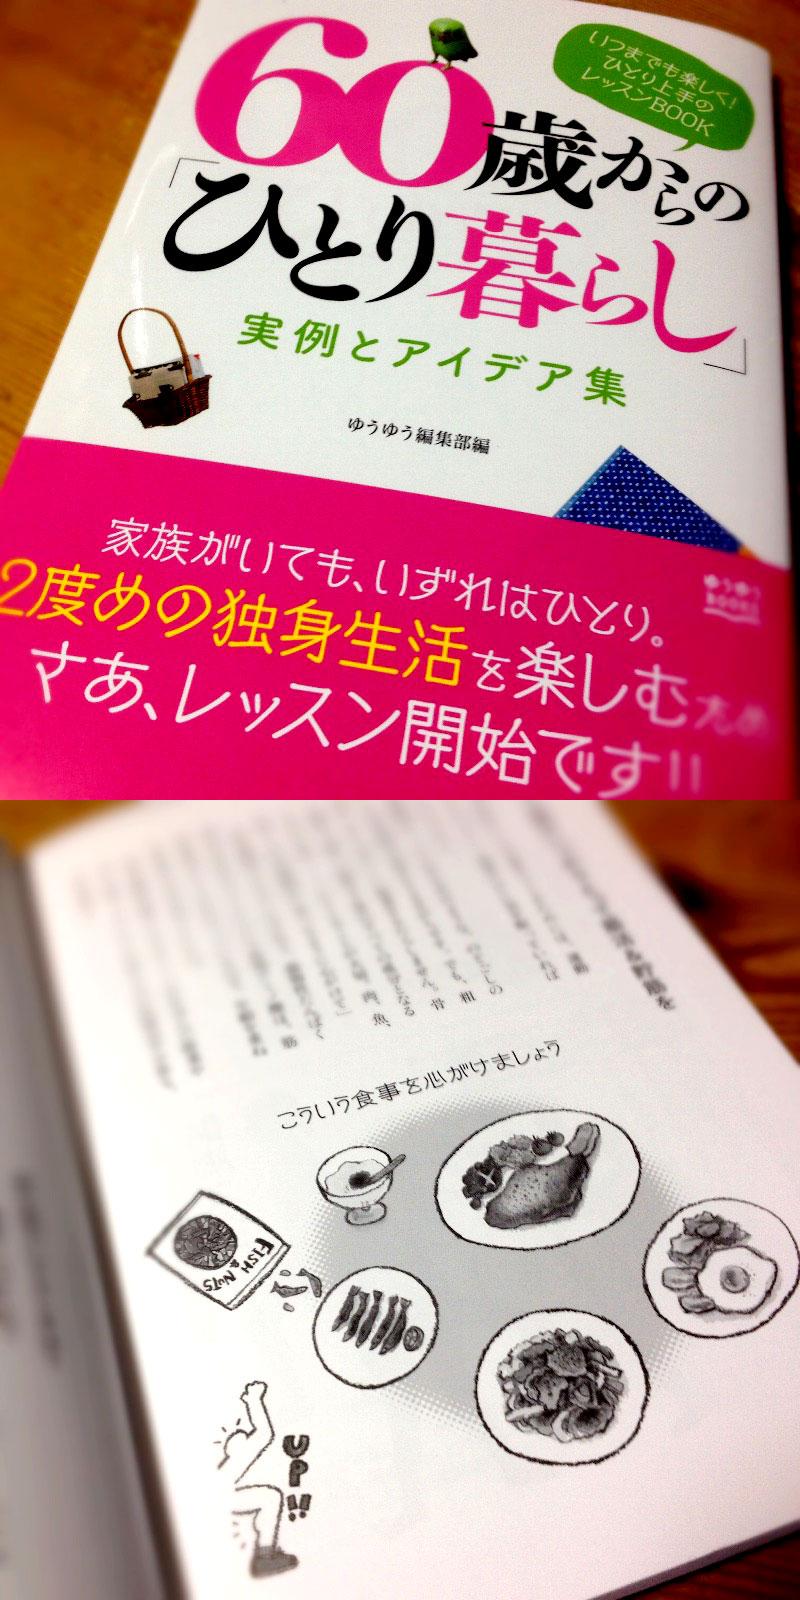 150729yuyu_9332a.jpg